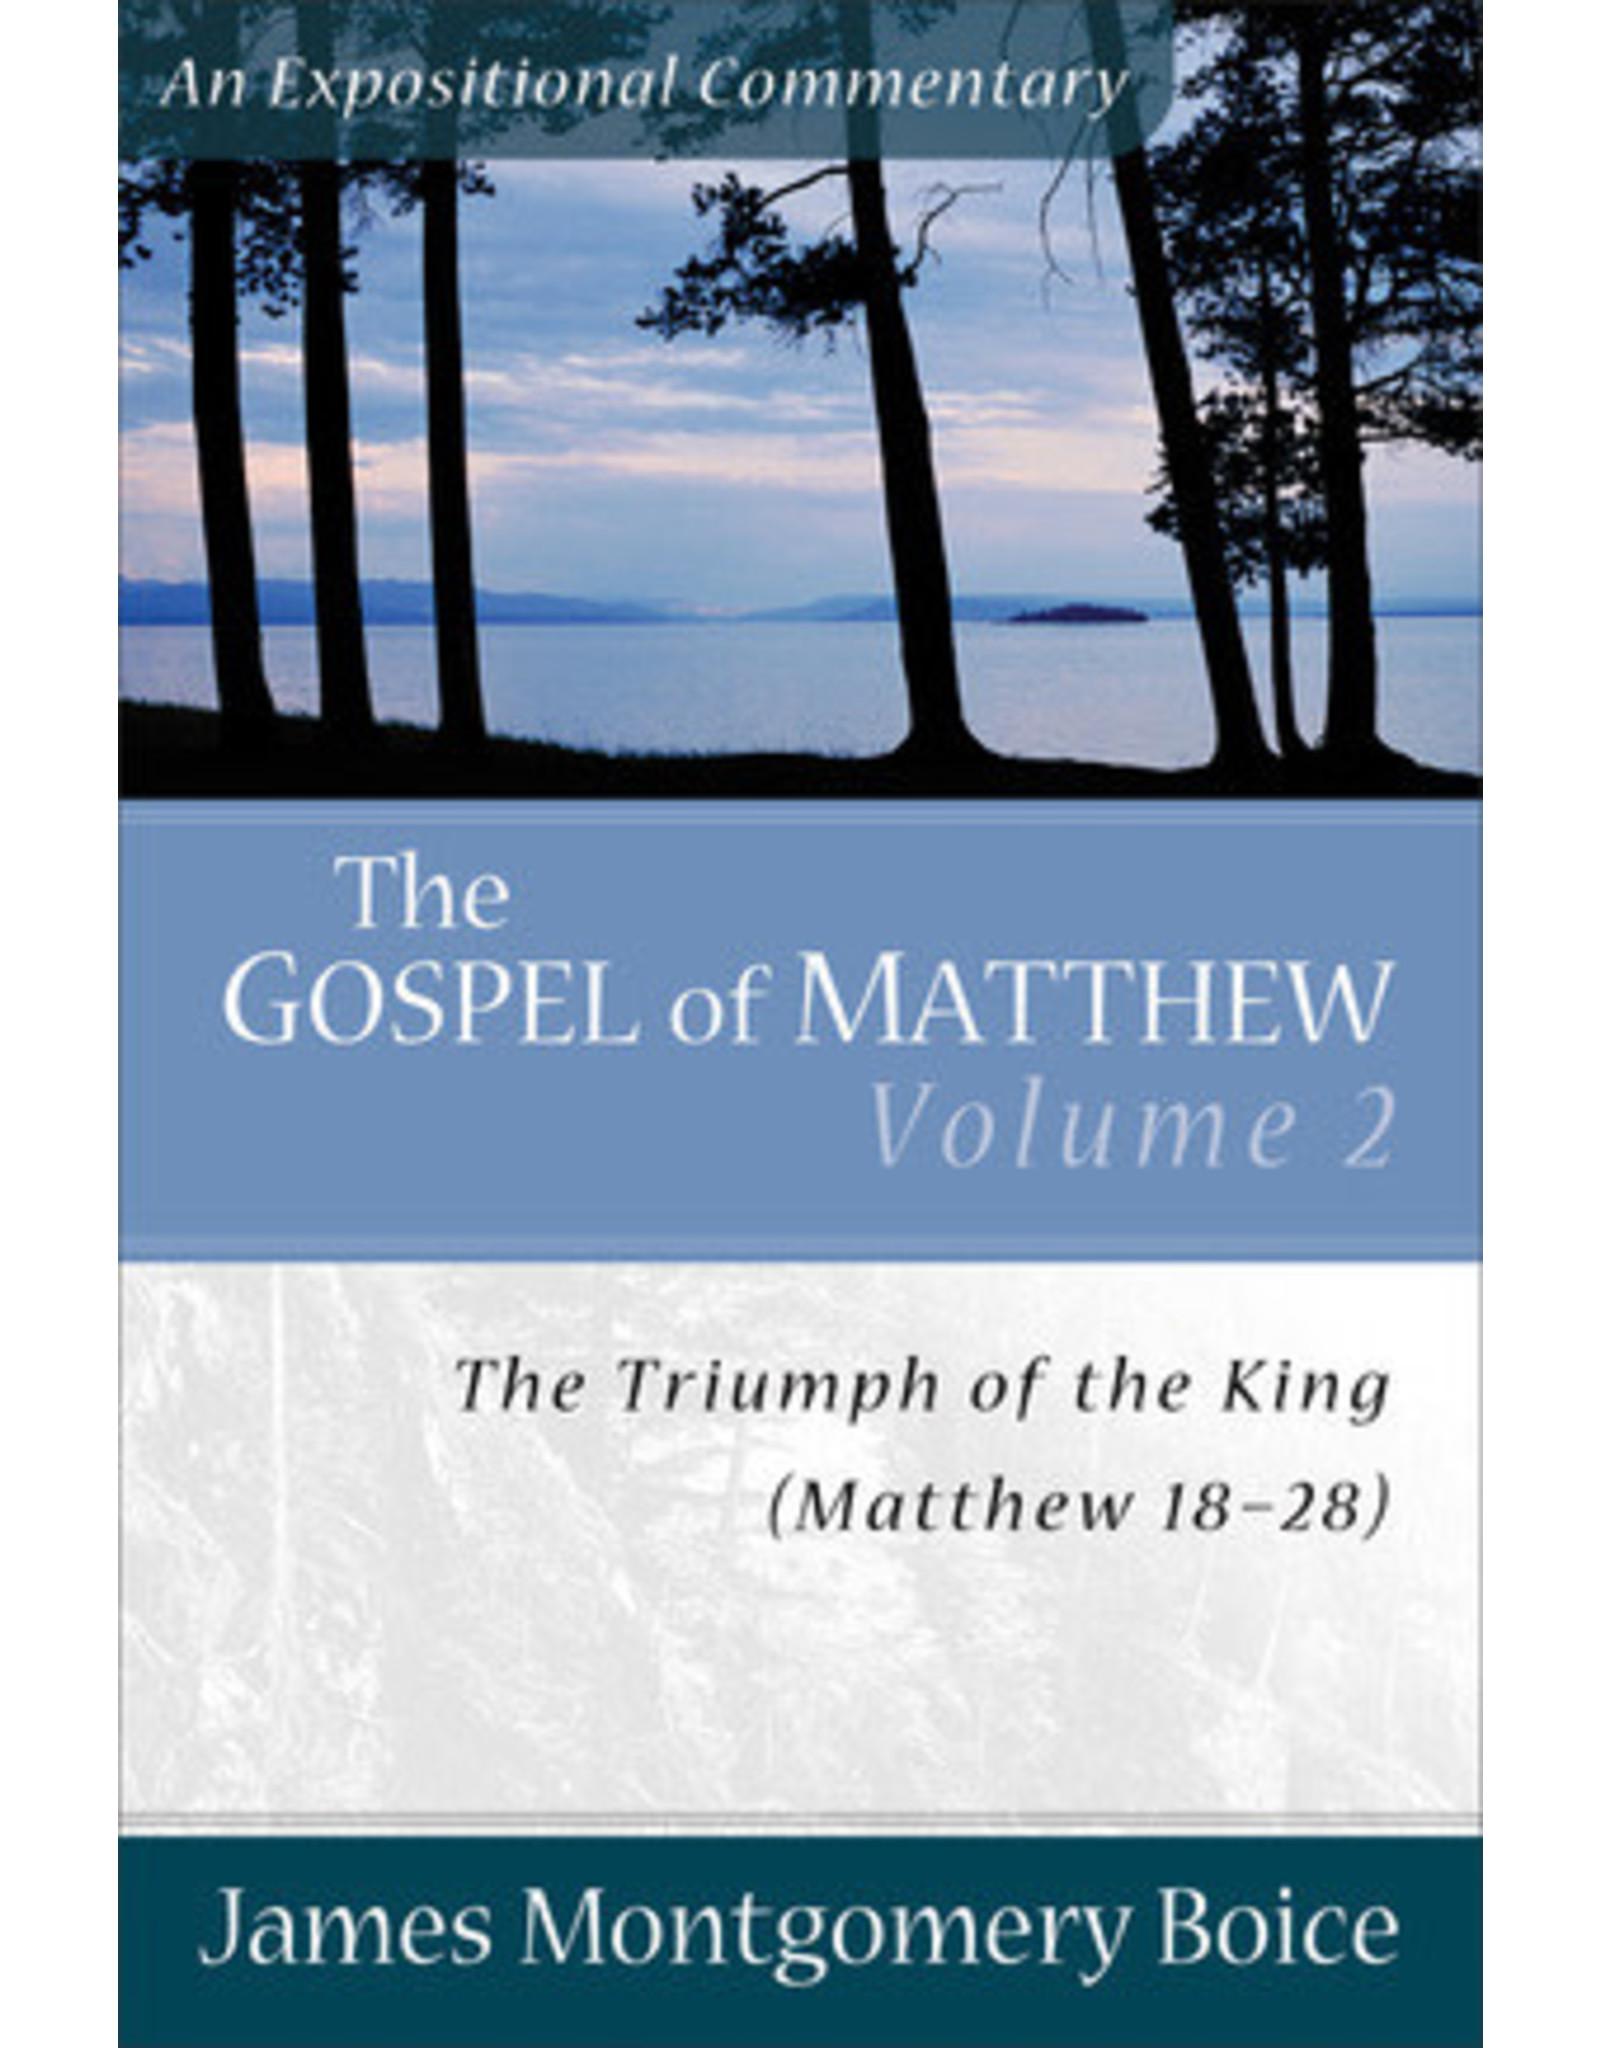 Boice The Gospel of Matthew 18-28: Vol 2; An Expositional Commentary